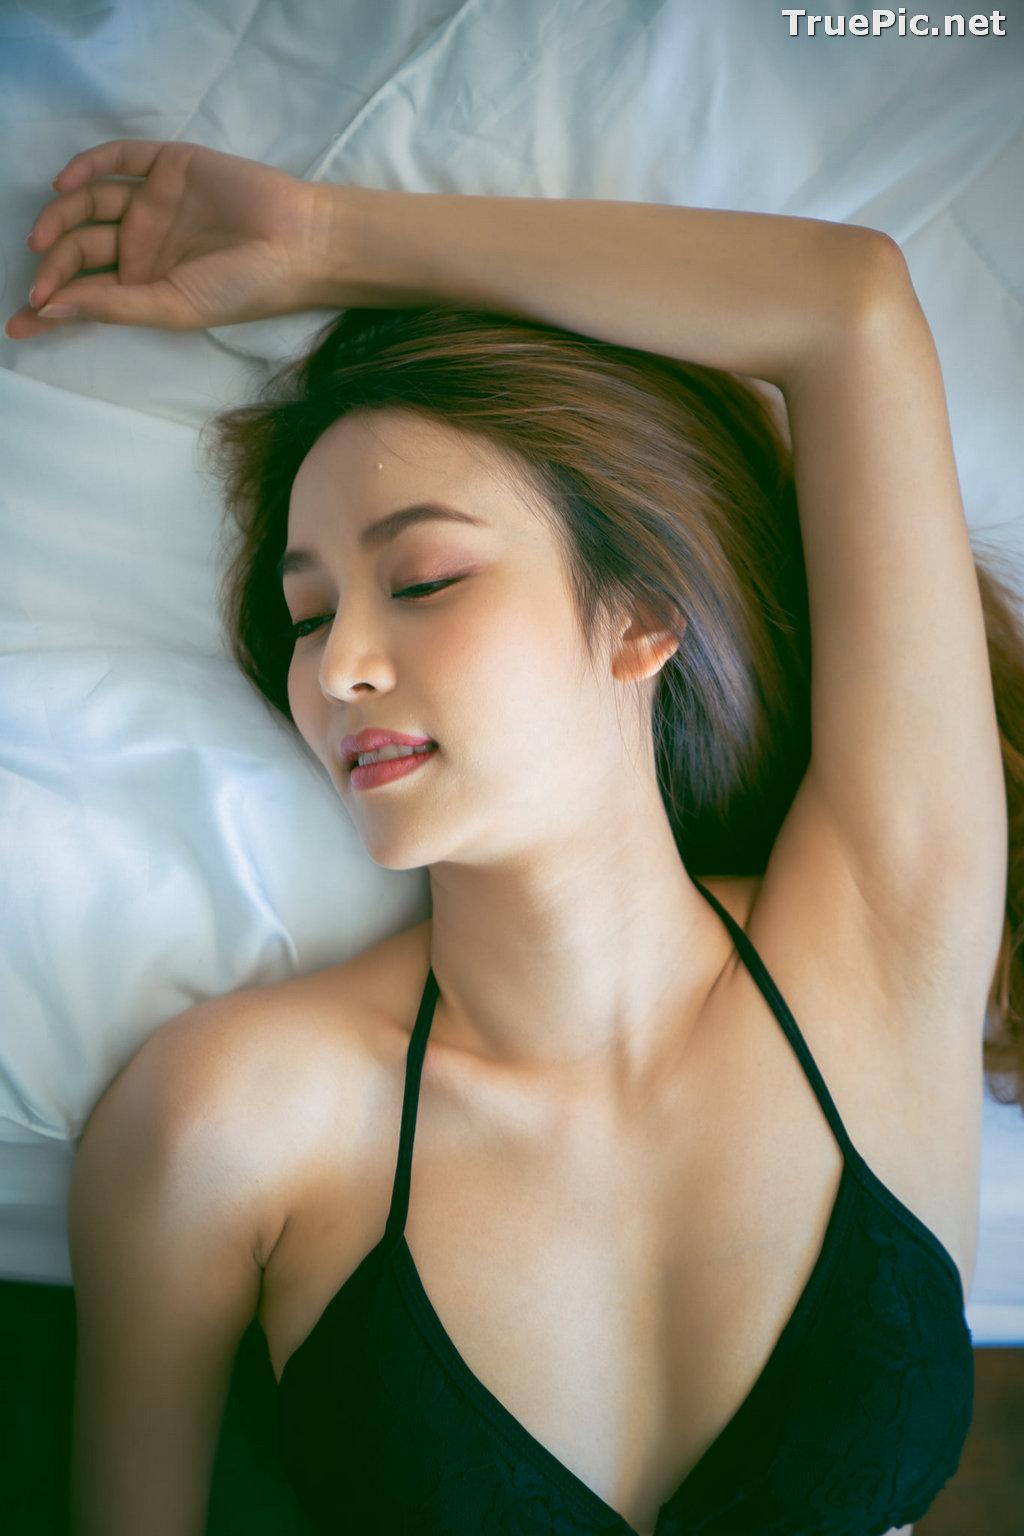 Image Thailand Model - Noppawan Limapirak (น้องเมย์) - Beautiful Picture 2021 Collection - TruePic.net - Picture-69